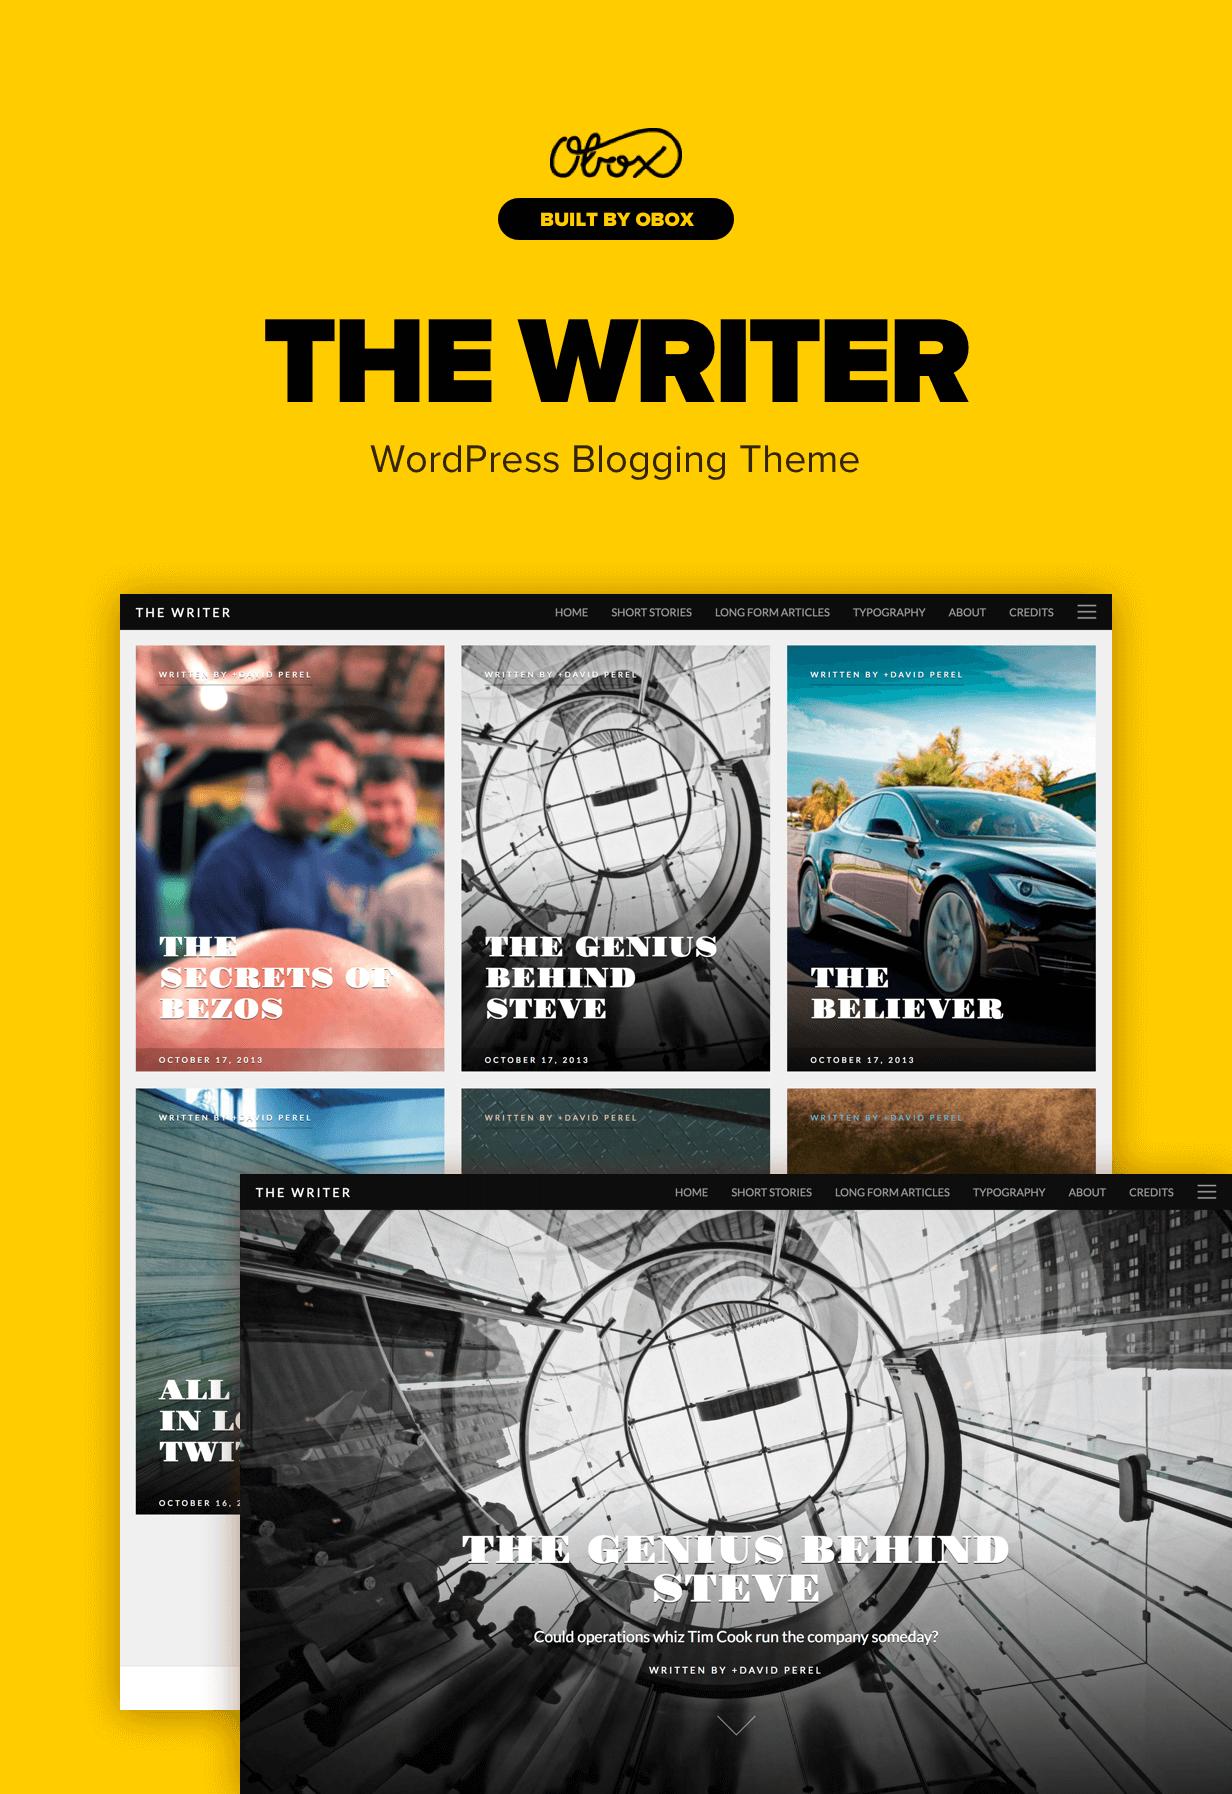 writer2 - The Writer - Premium WordPress Blogging Theme